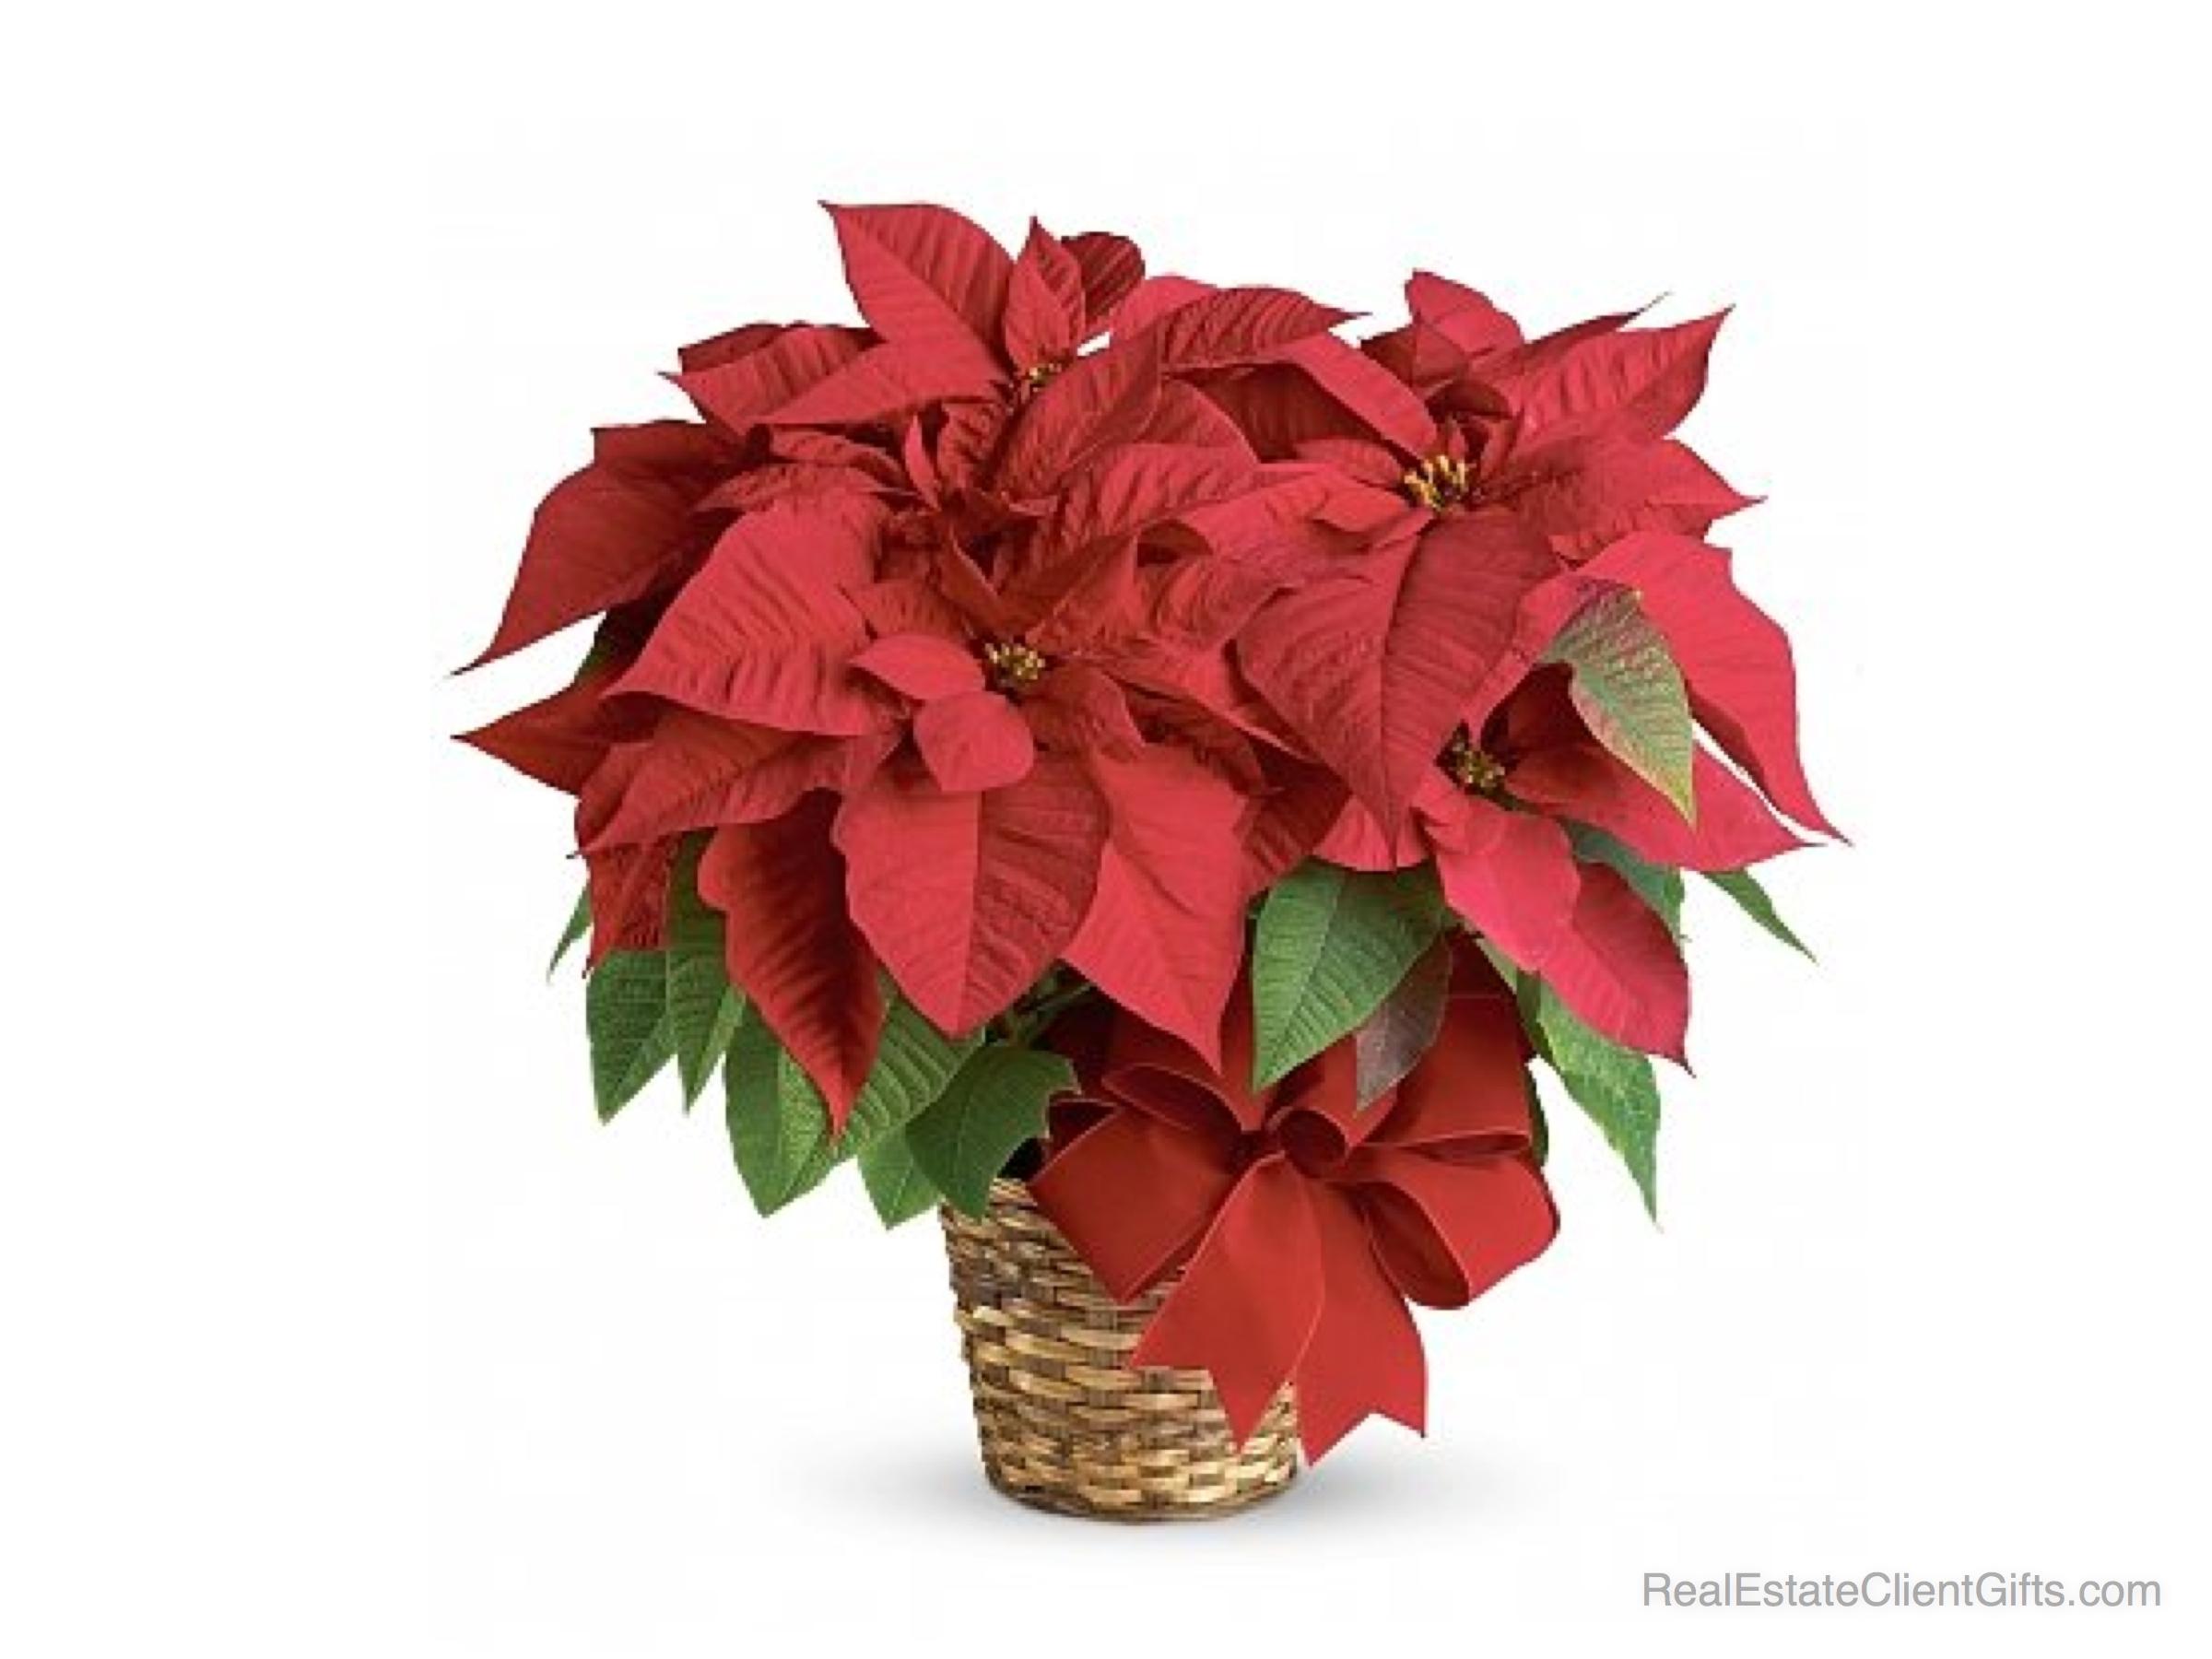 Realtor Christmas Gift Idea - Stunning Red Poinsettia